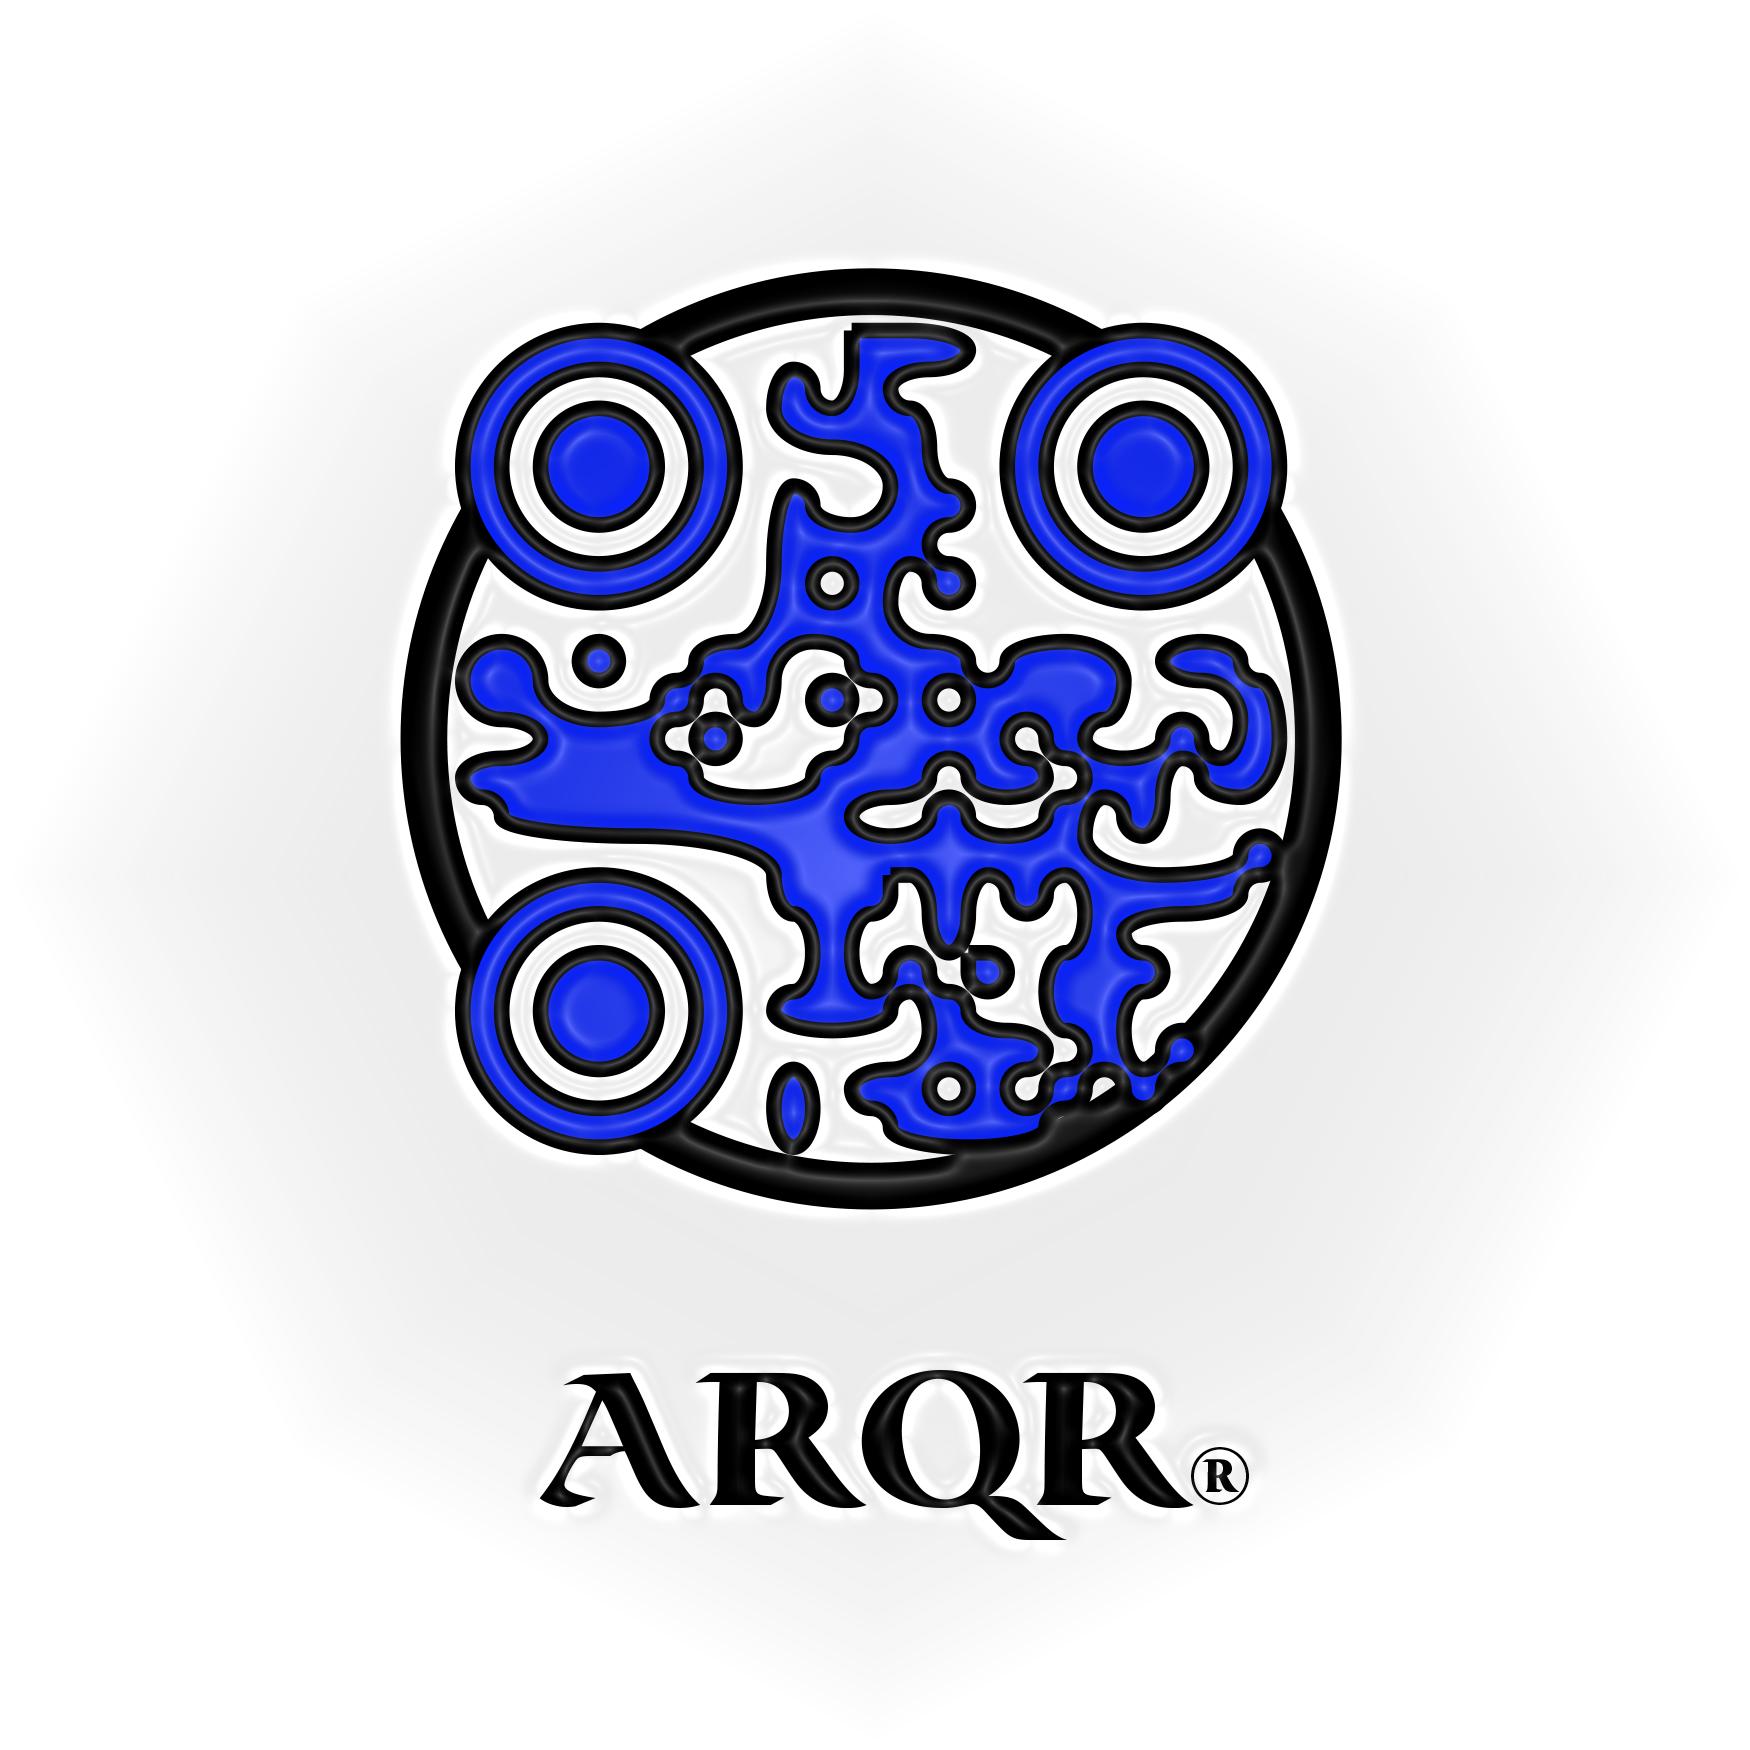 Arqr ar qr arqr code for arqr by laird marynick buycottarizona Choice Image